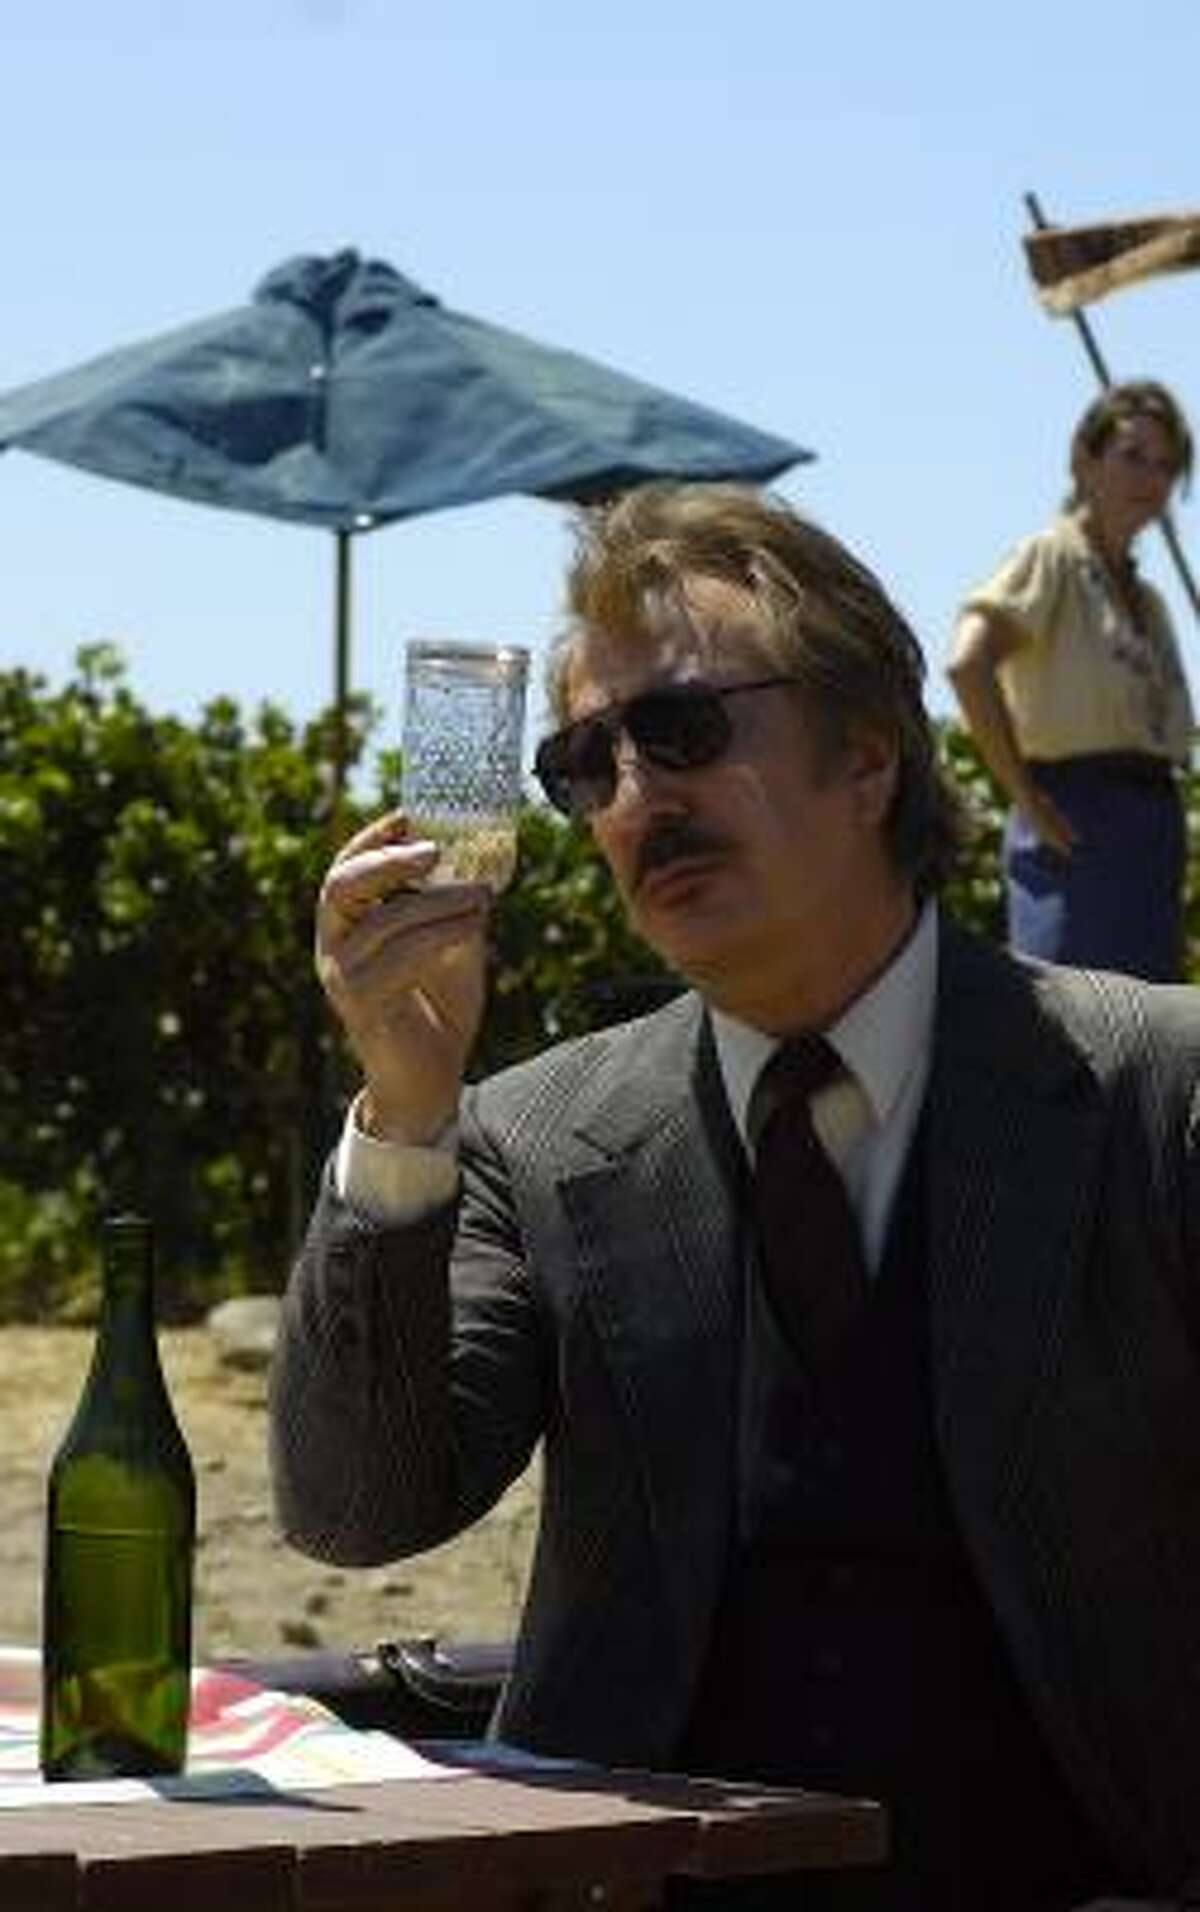 Steven Spurrier (Alan Rickman) examines a bottle of wine in Bottle Shock.